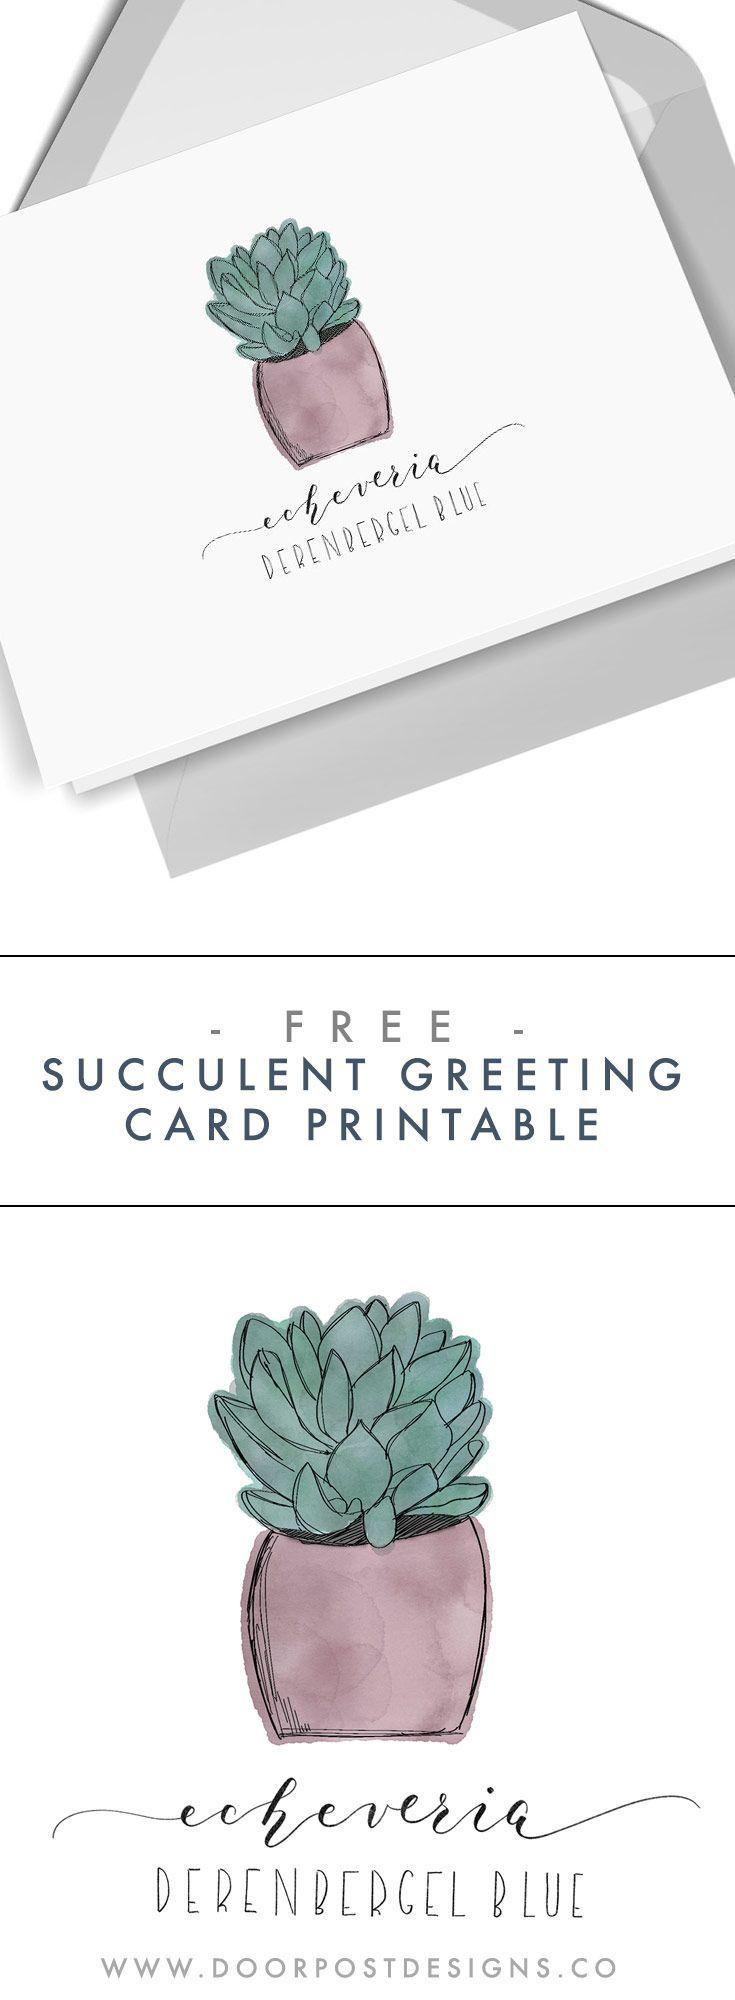 Freebie Printable Succulent Greeting Card Printable Greeting Cards Fall Greeting Cards Free Greeting Cards